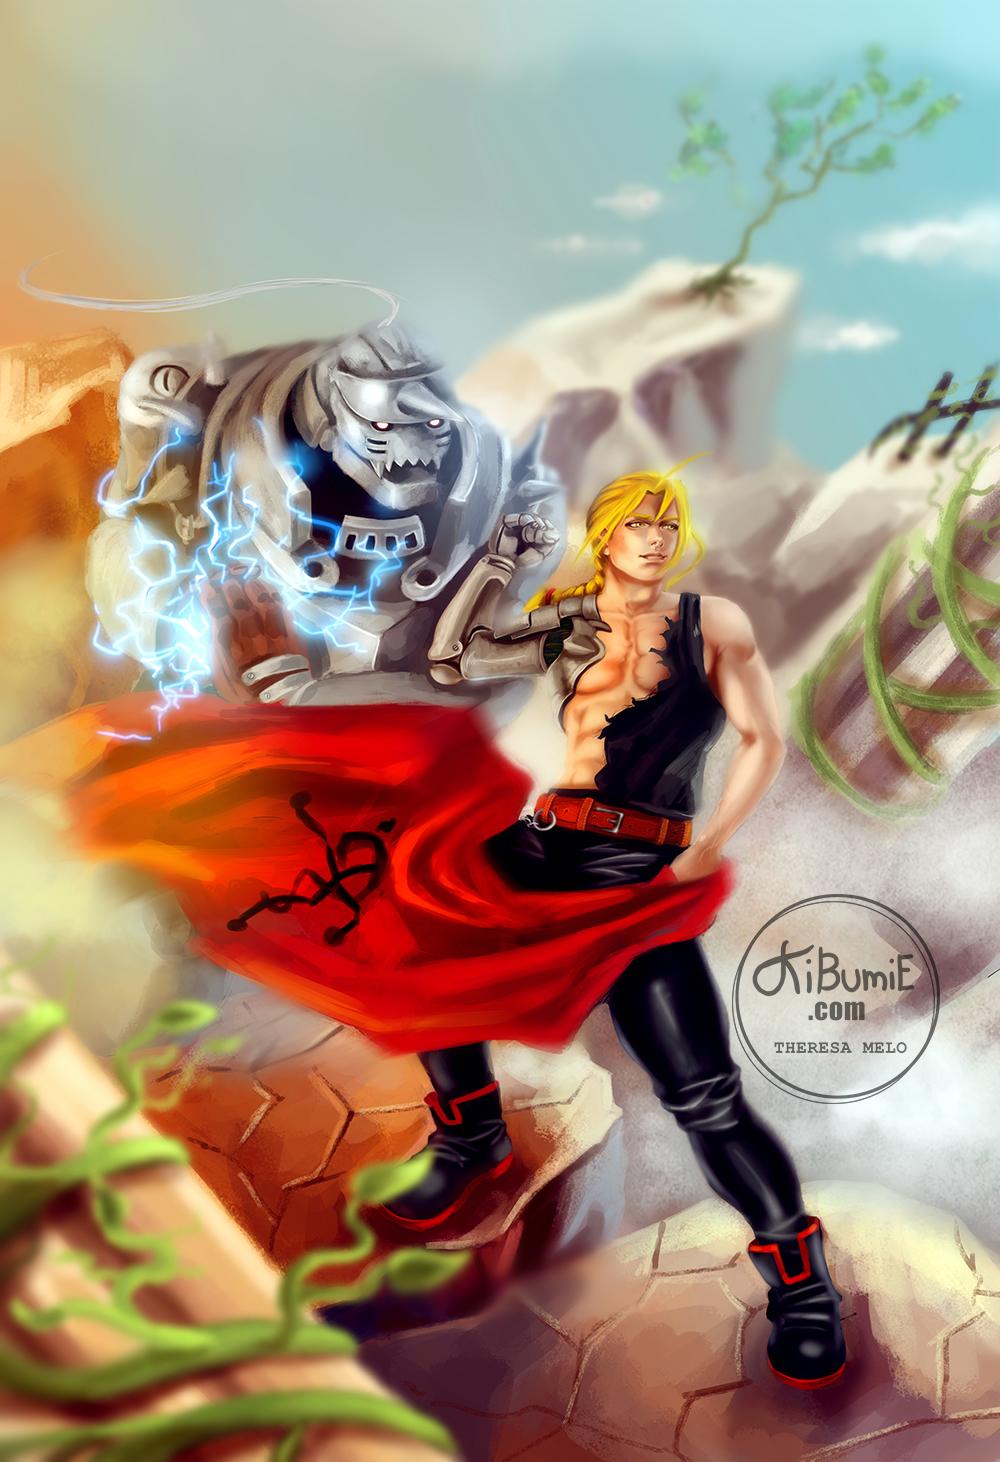 Fullmetal Alchemist by kibumie-art